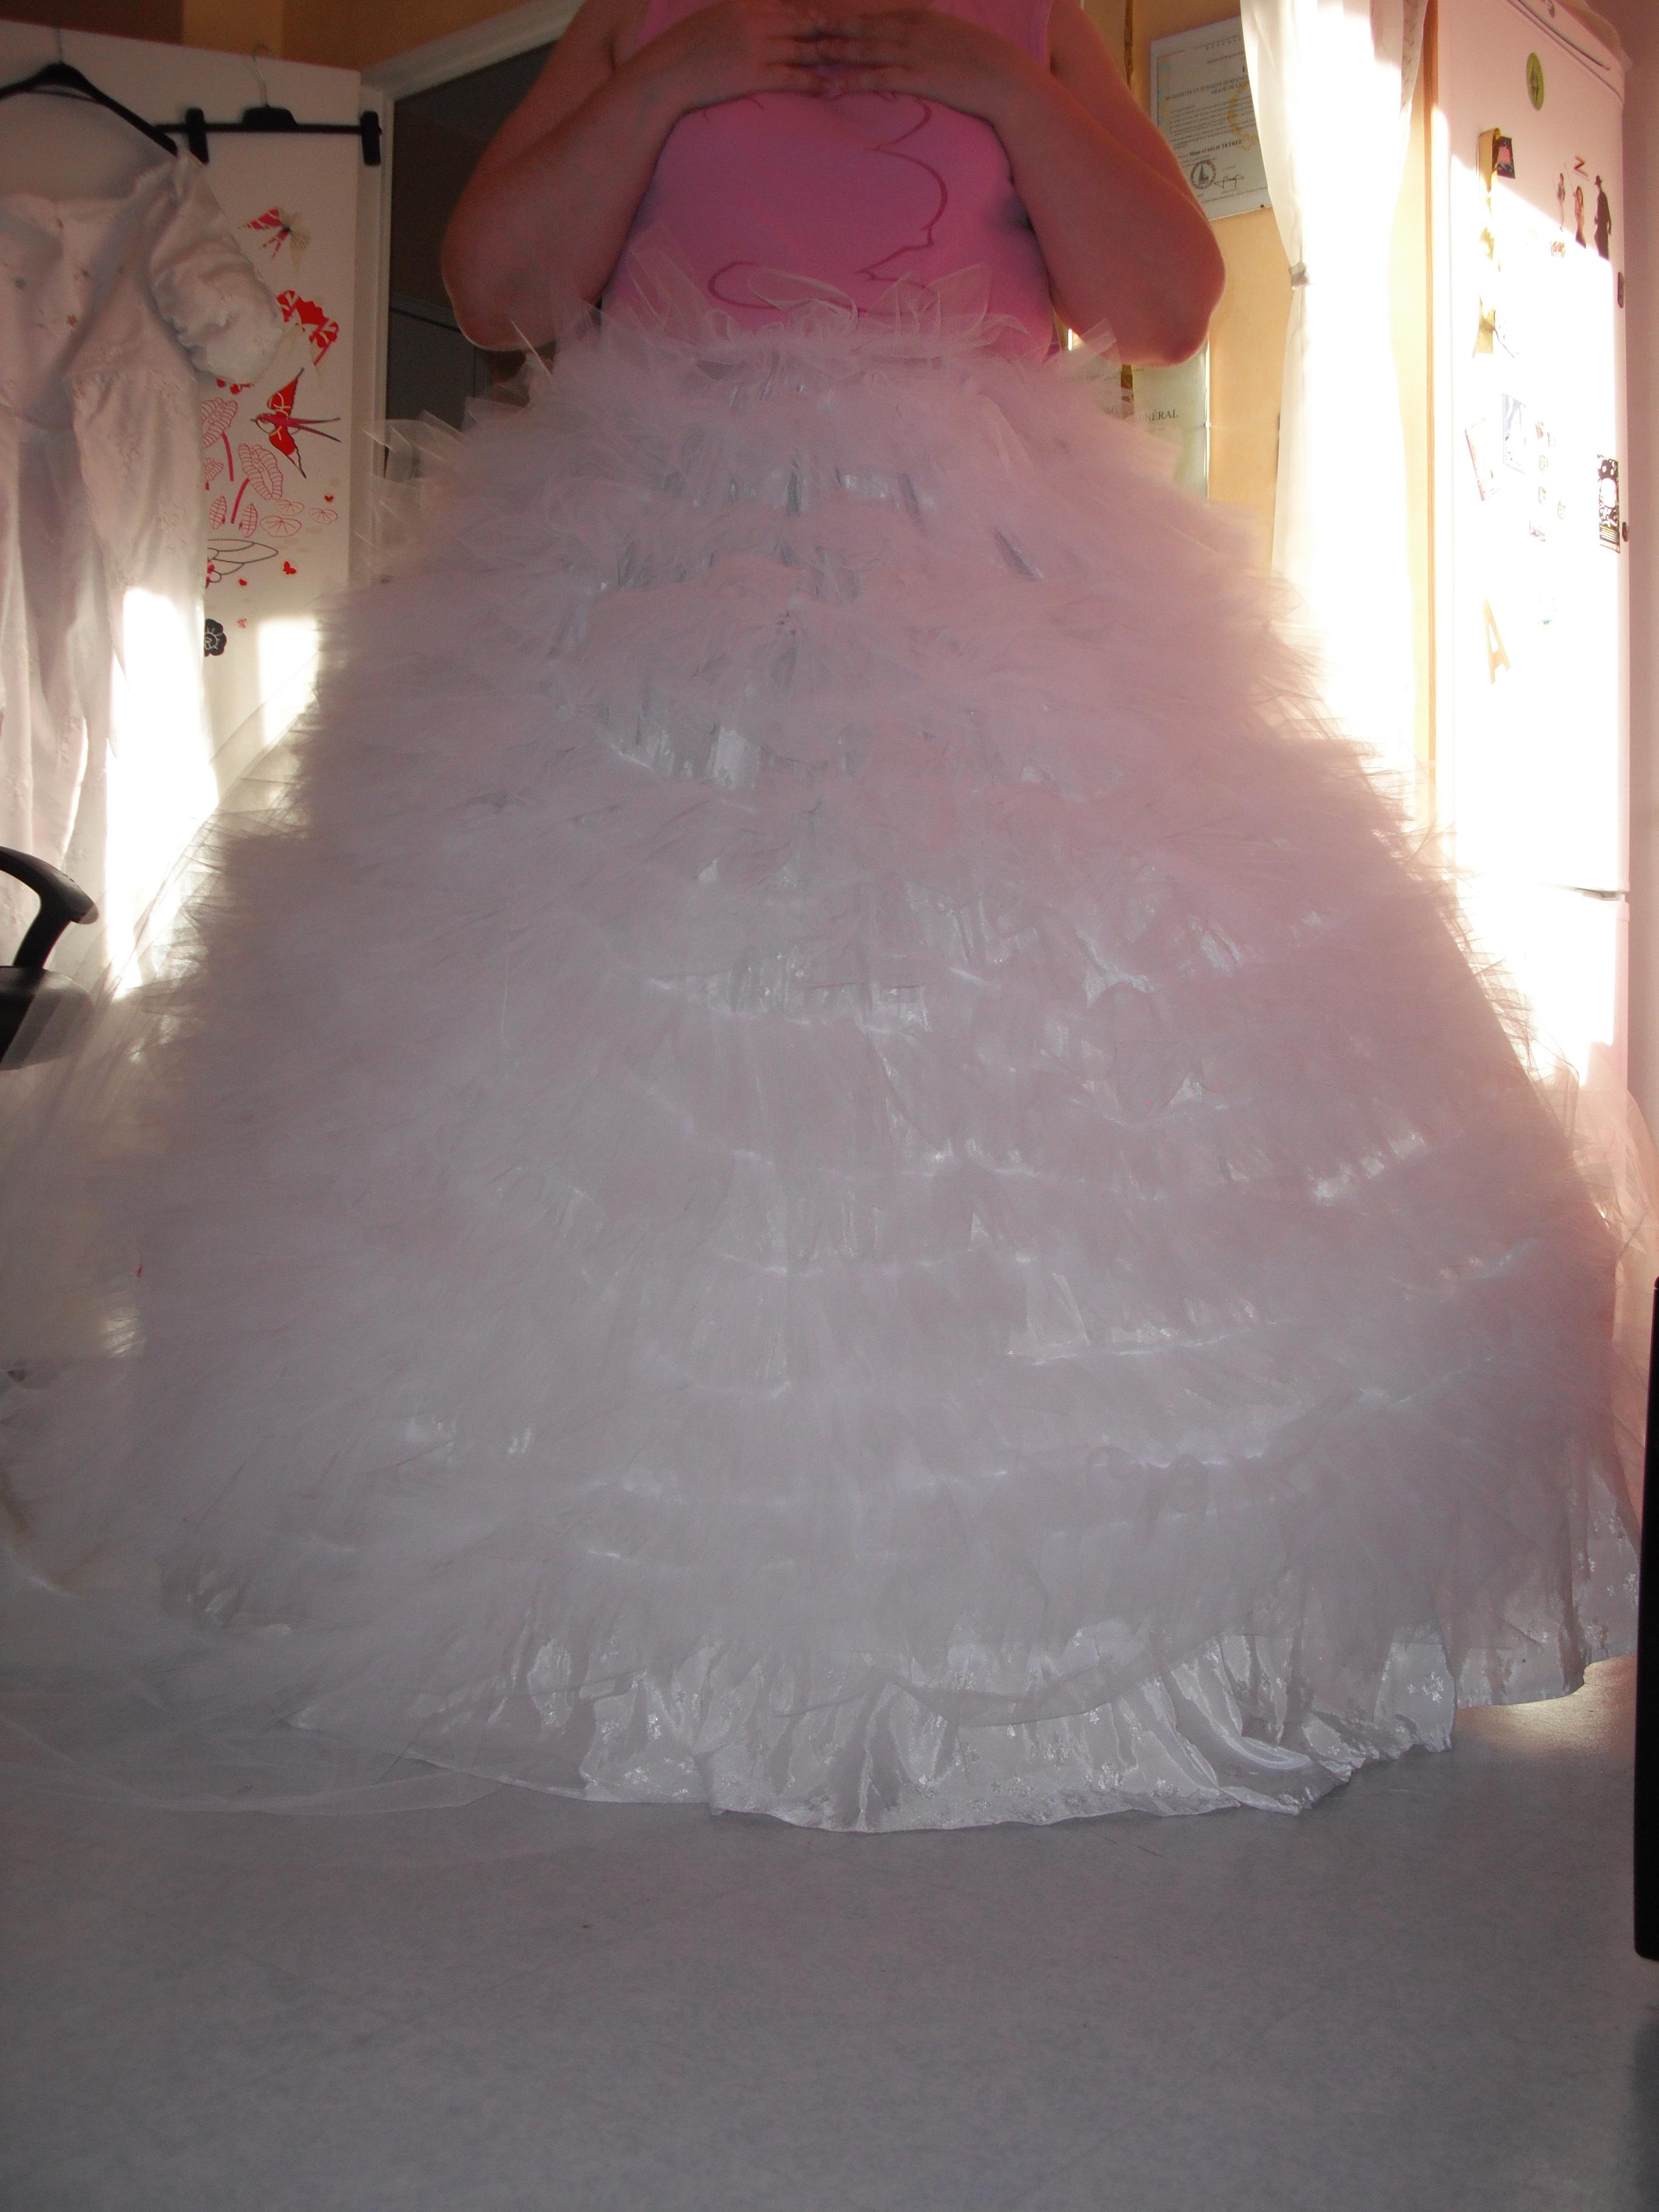 Comment repasser robe de mariée